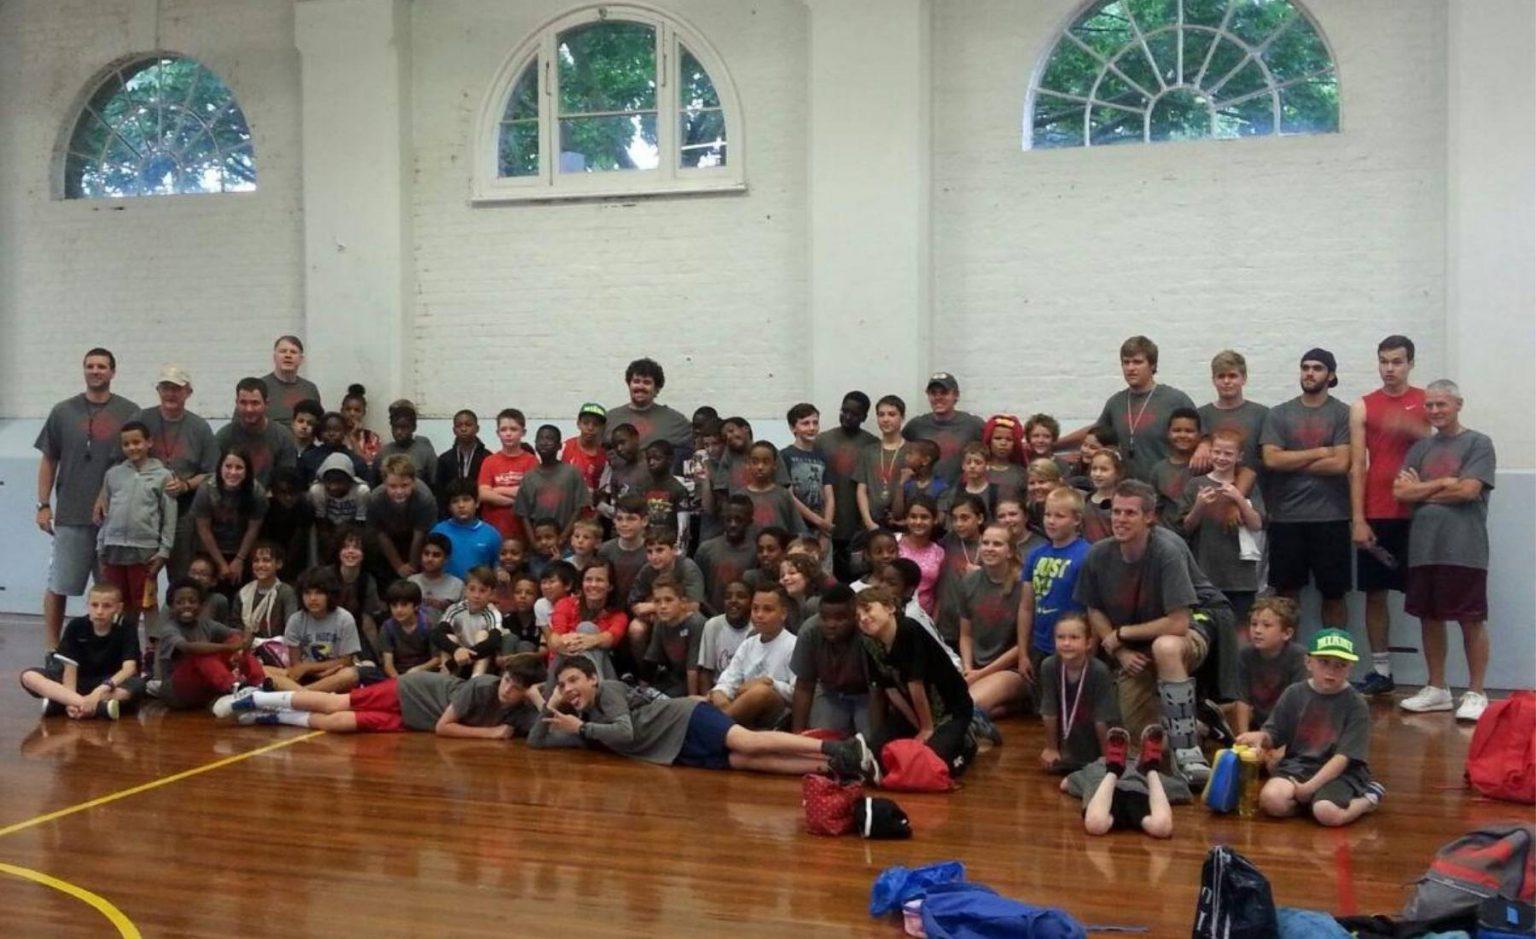 London Pulse Basketball Club